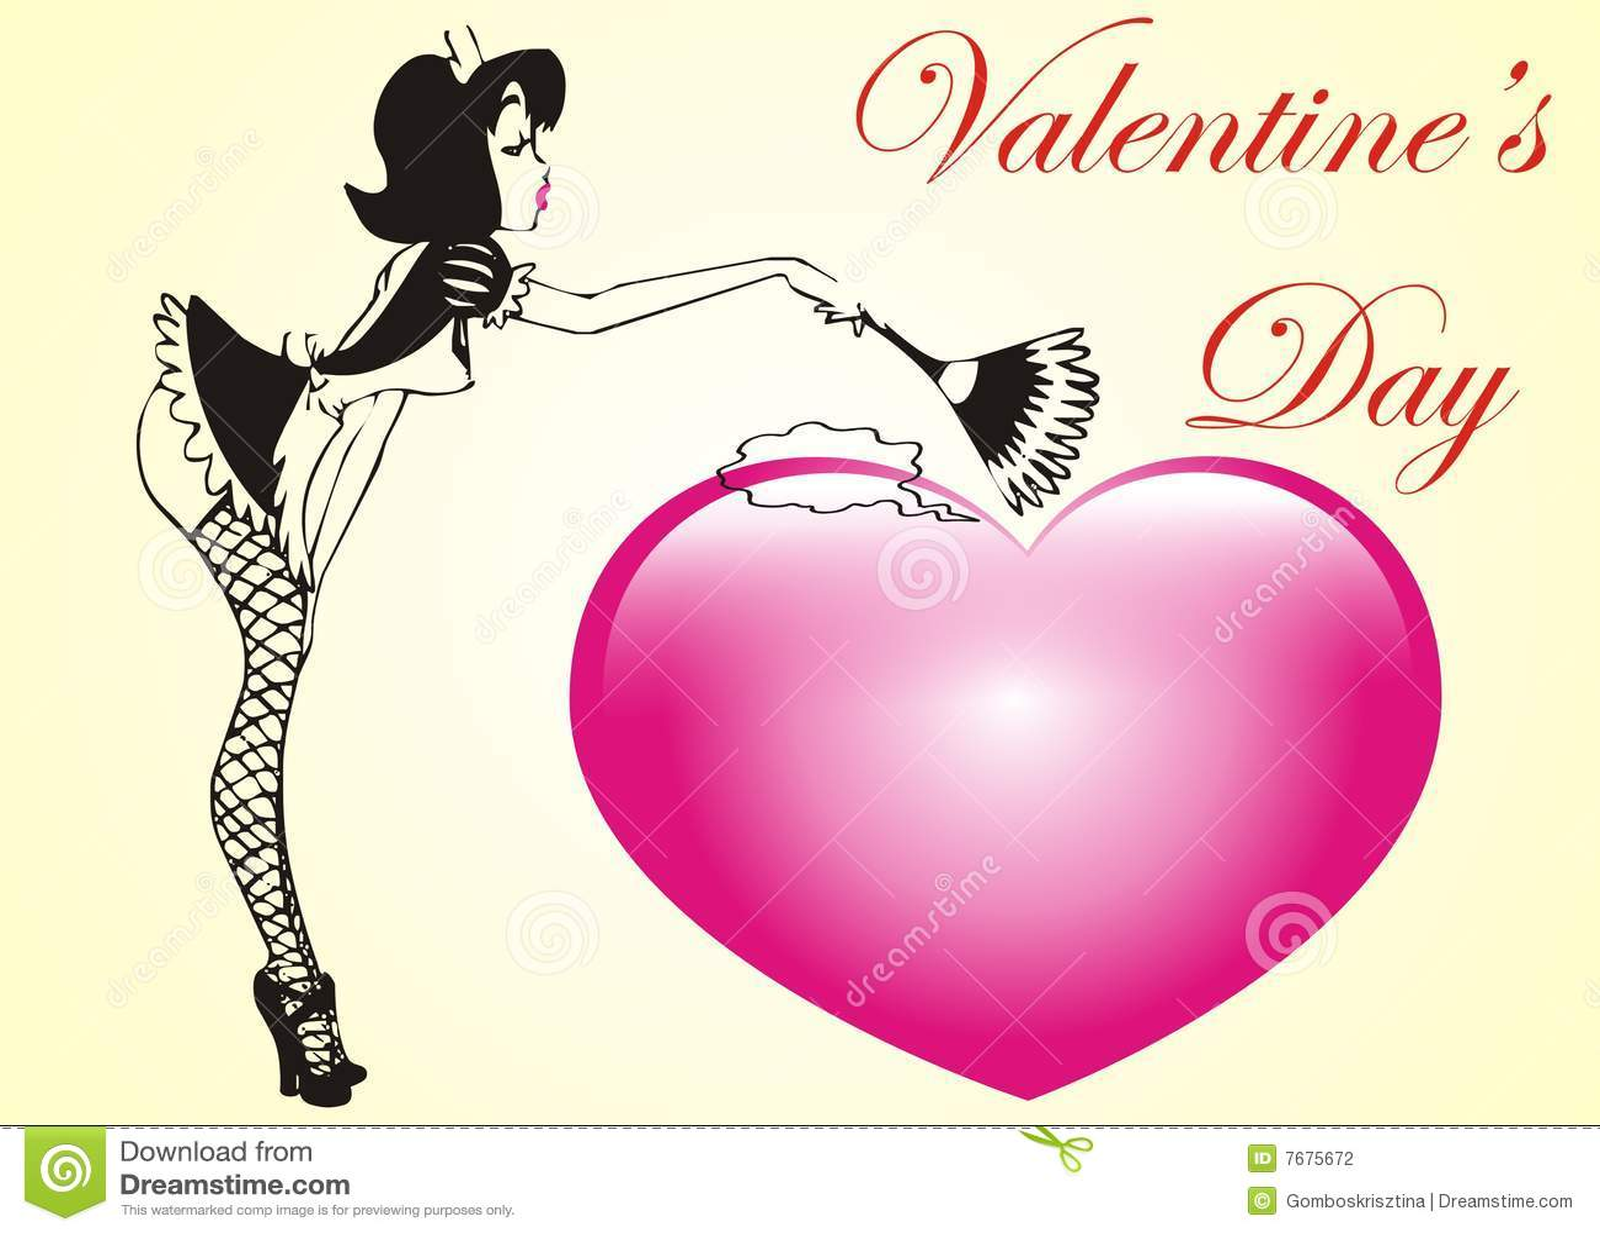 Sexy valentine heart jpeg